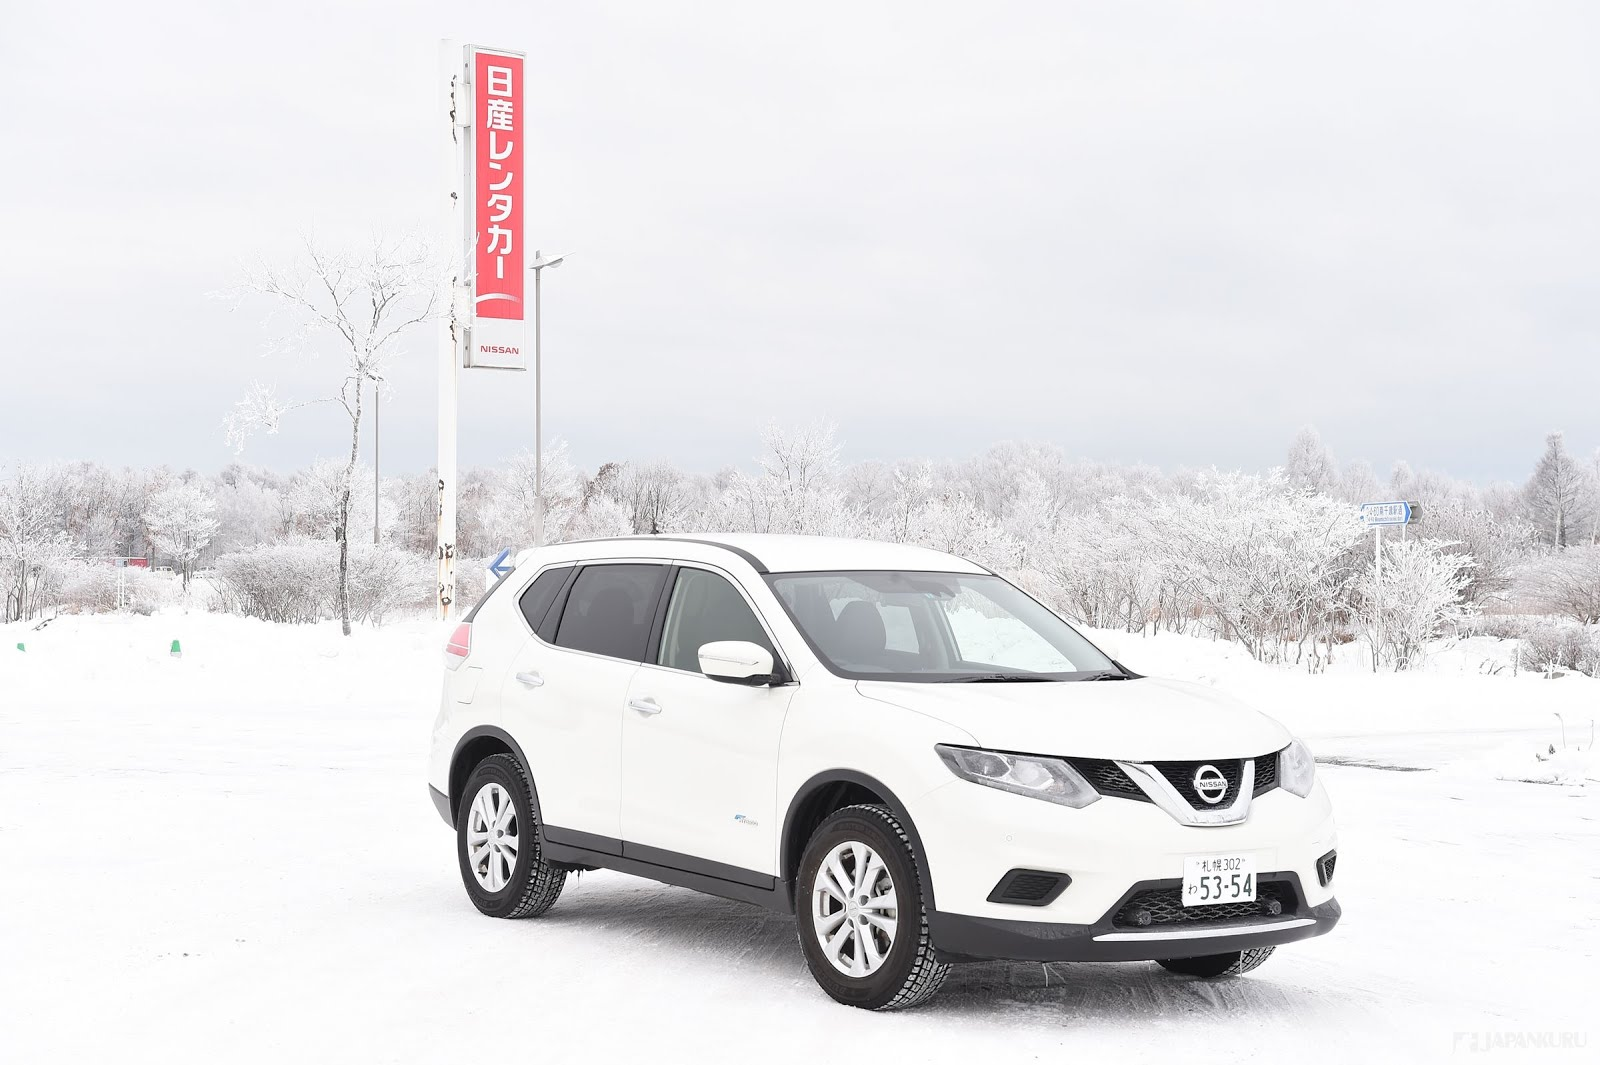 JAPANKURU: #Travel♪ Hokkaido Road Trip - The Best Way to Enjoy ...